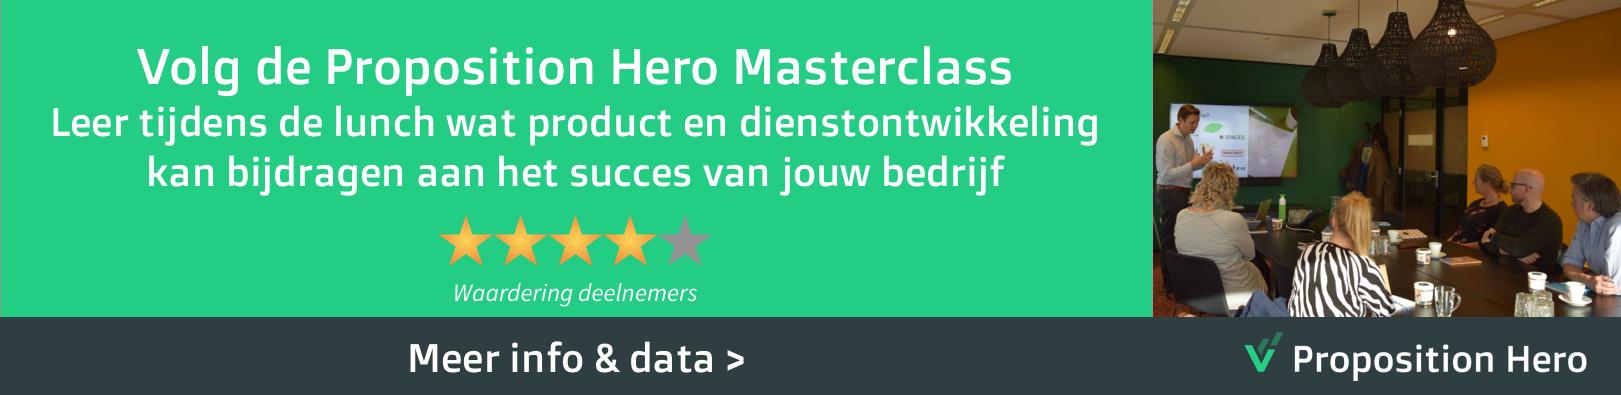 Banner Masterclass 2.png